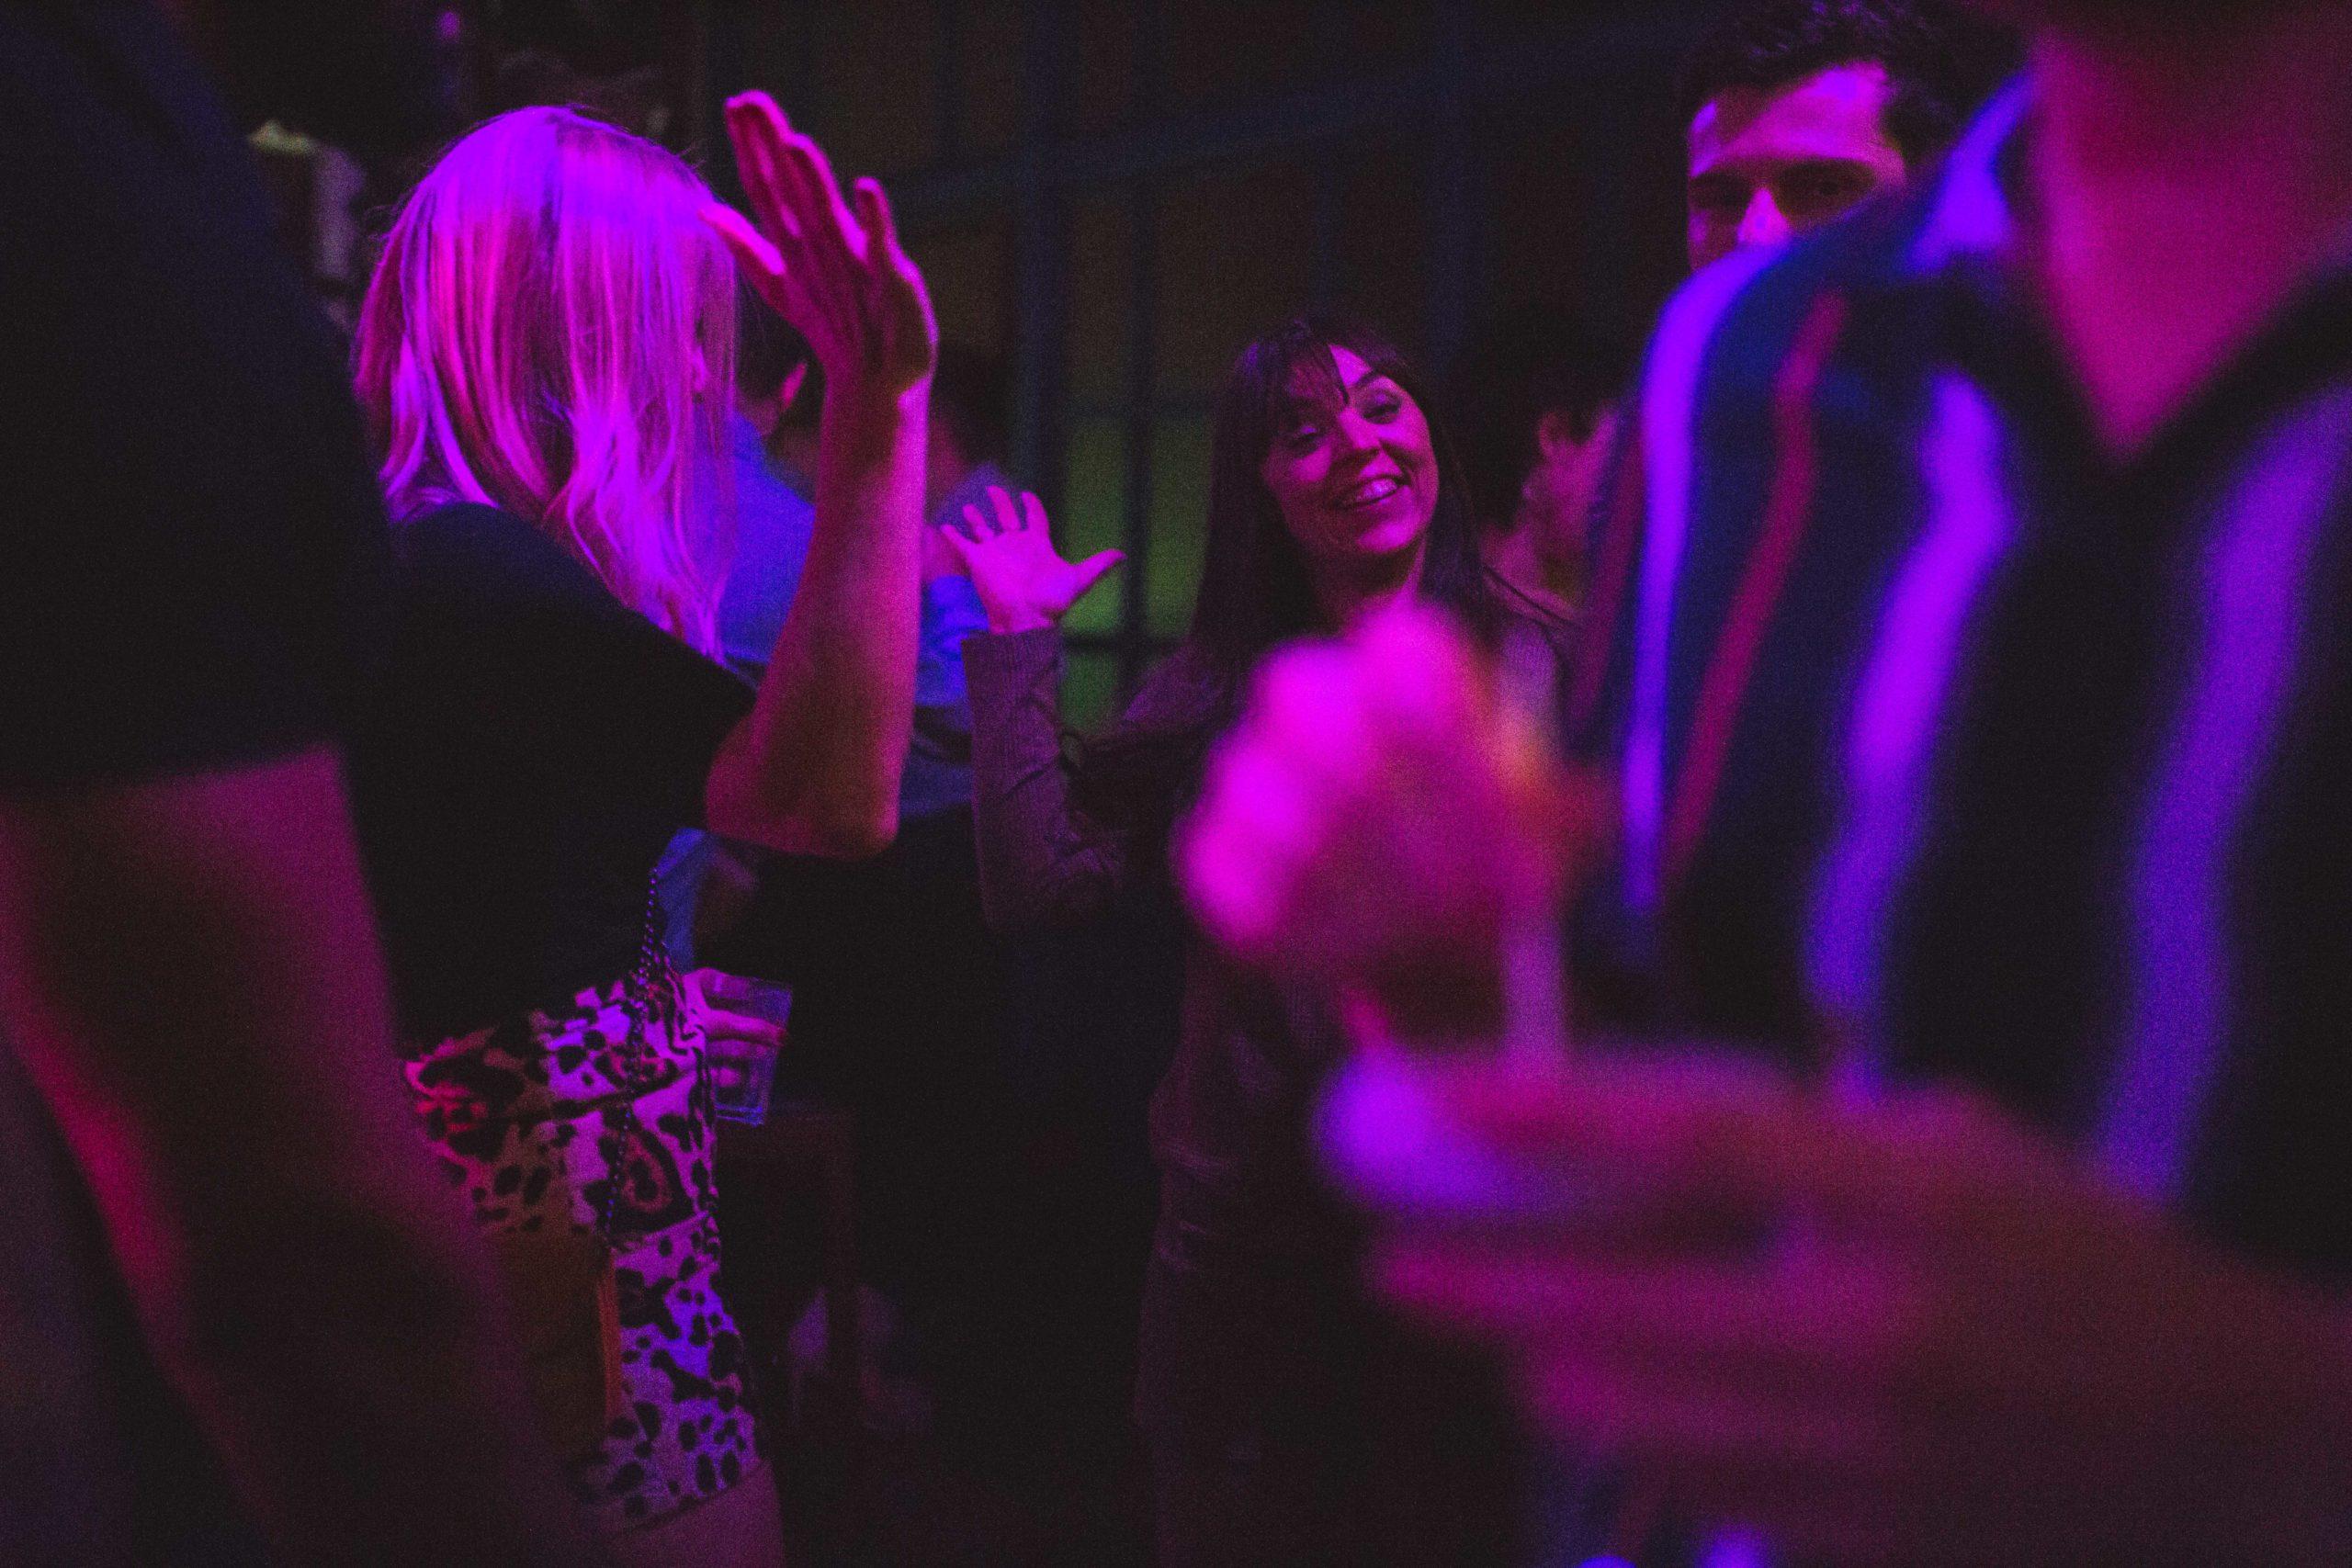 People dancing in the venue 1